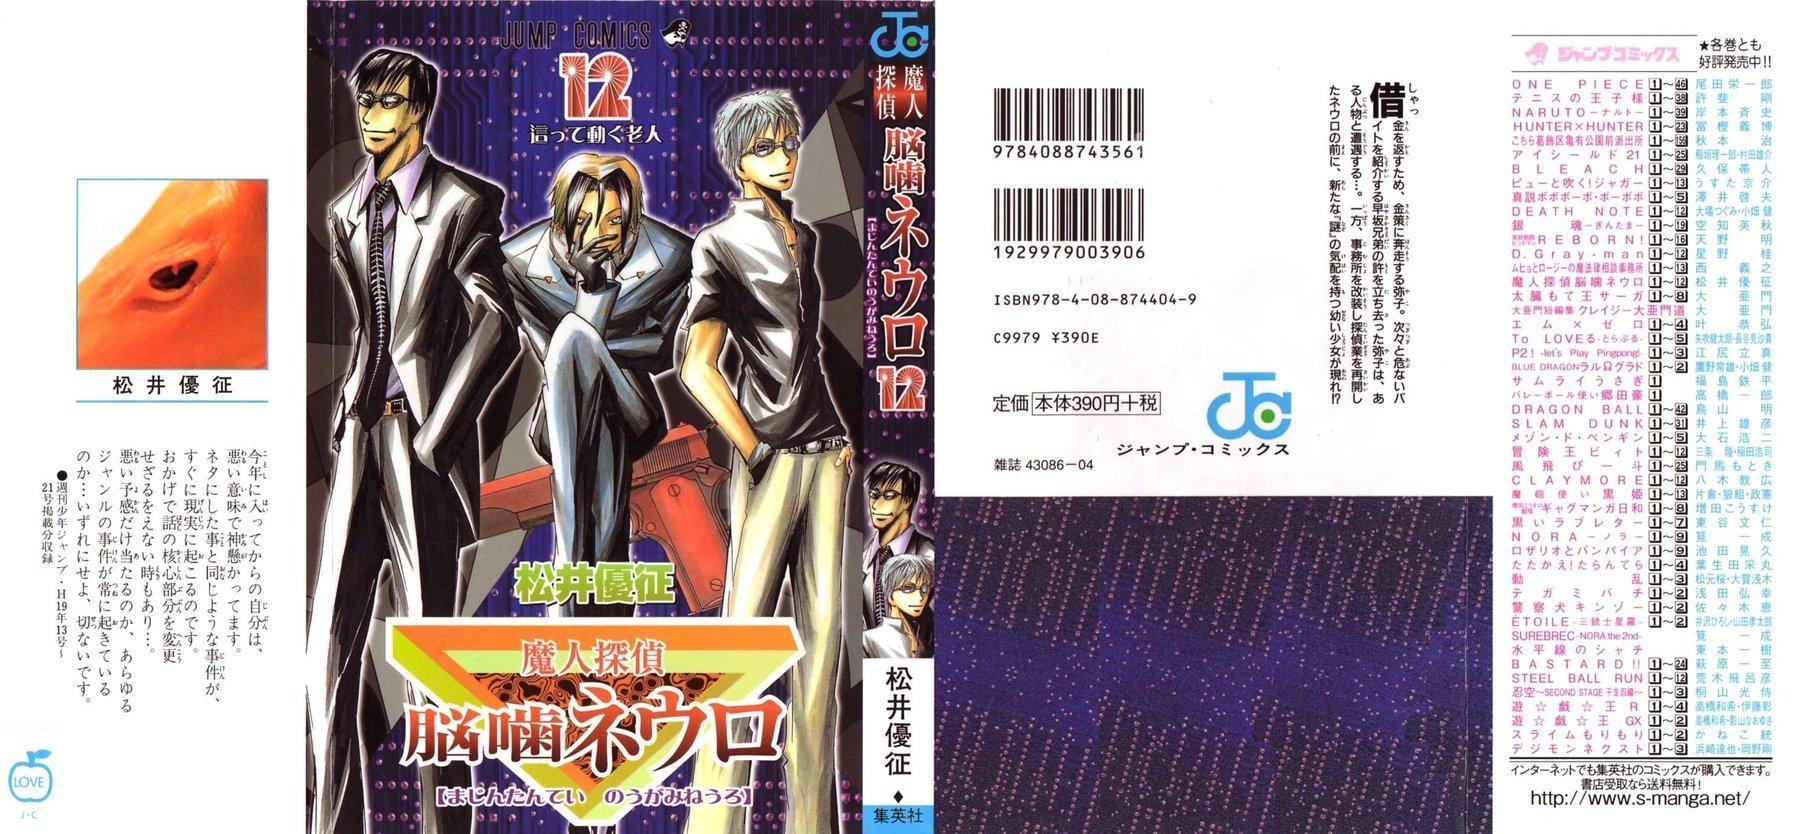 Манга Нейро Ногами - детектив из Ада - Глава 98 Страница 1